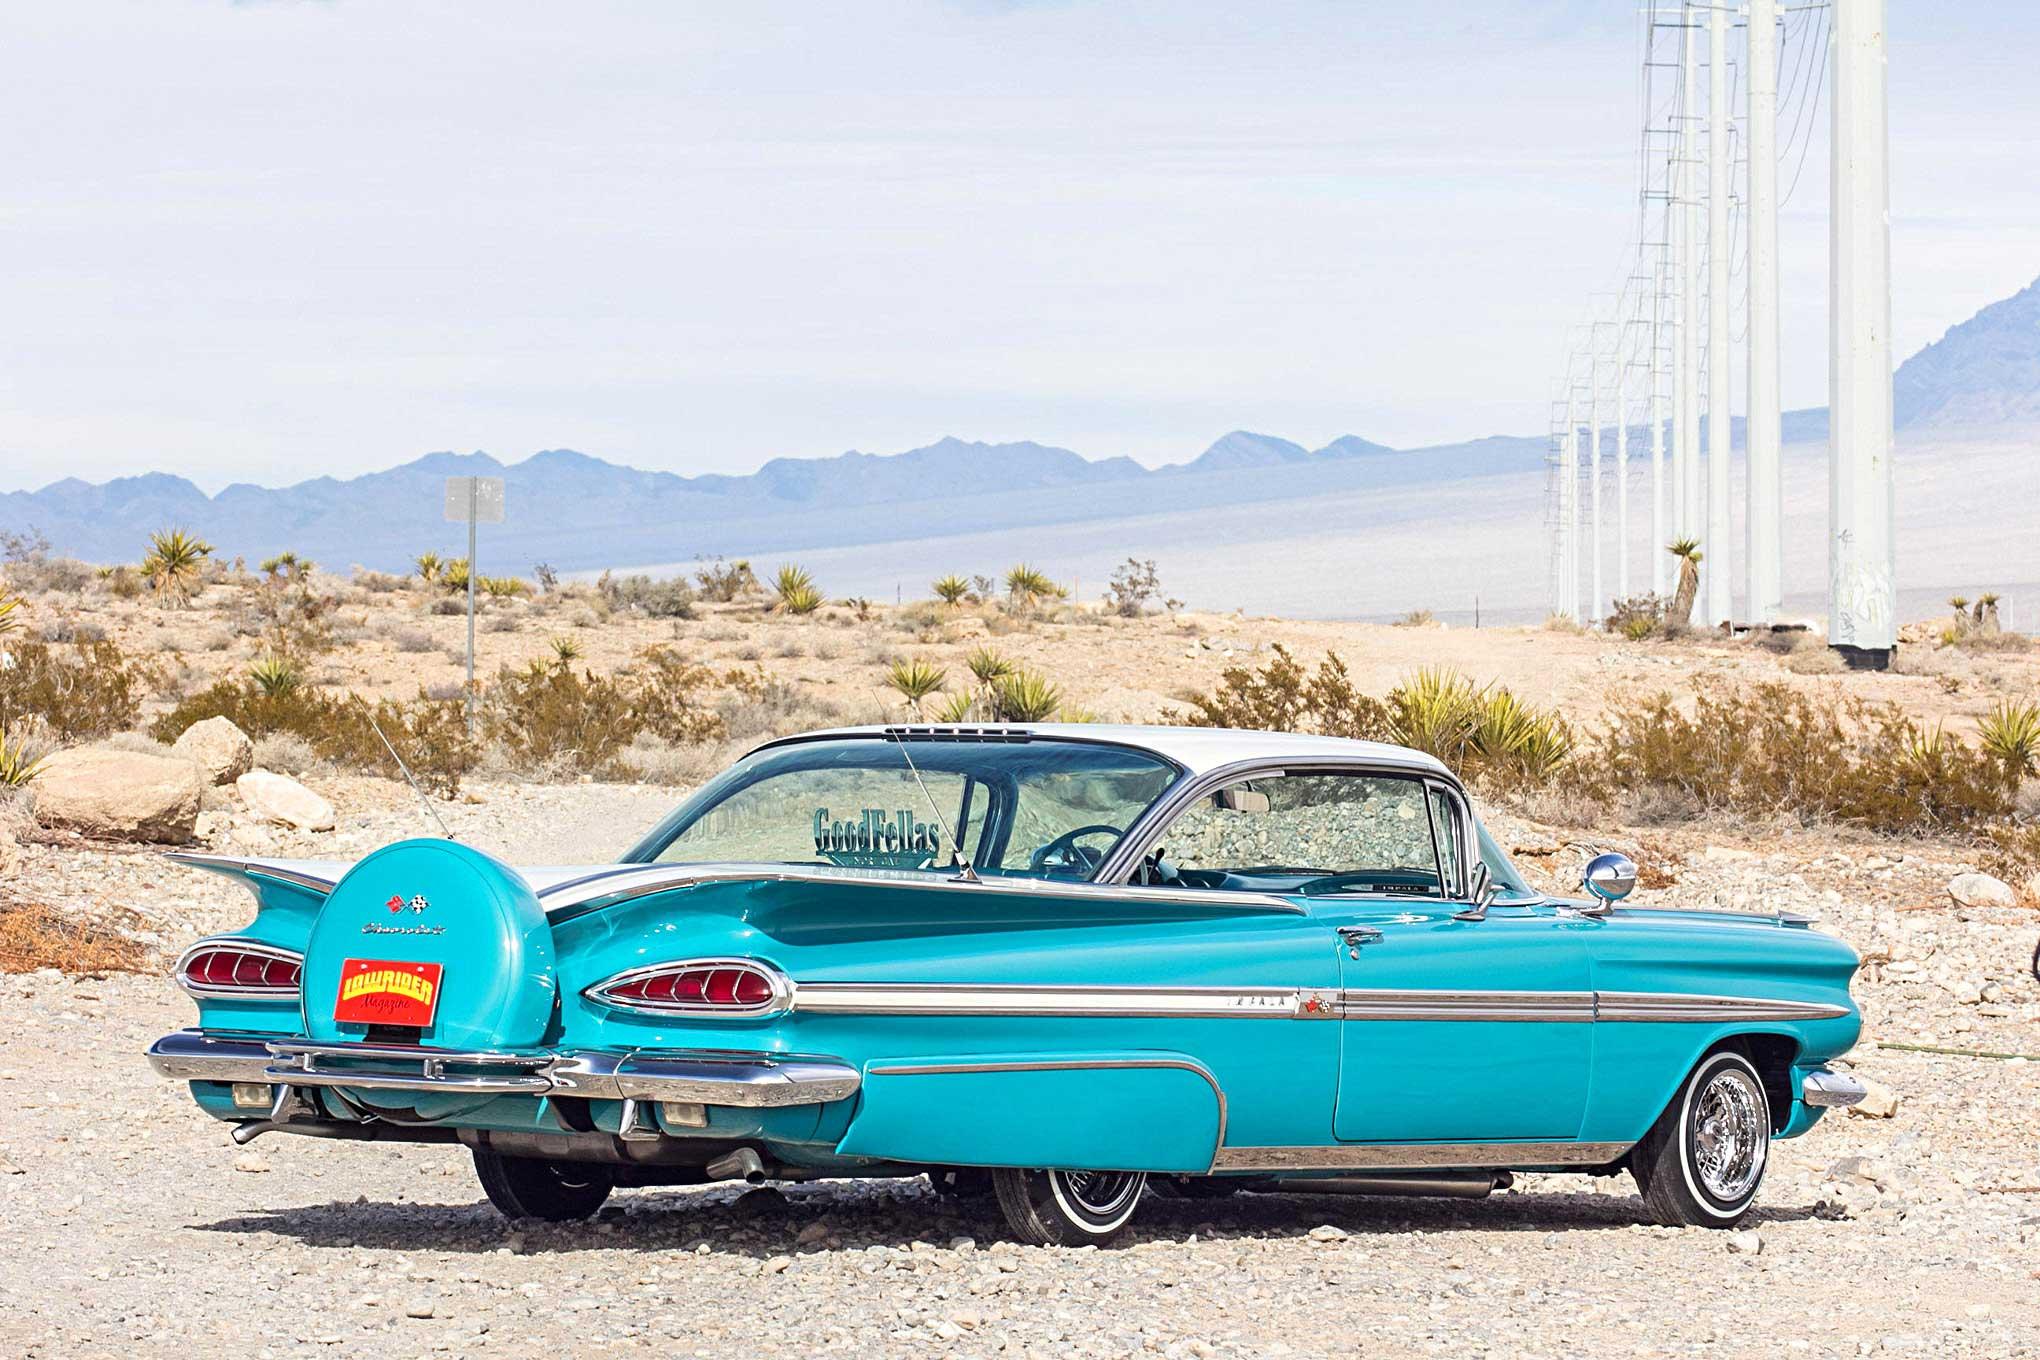 1959 Chevrolet Impala A Customary Custom Chevy Rear Wiring Harness 4 40